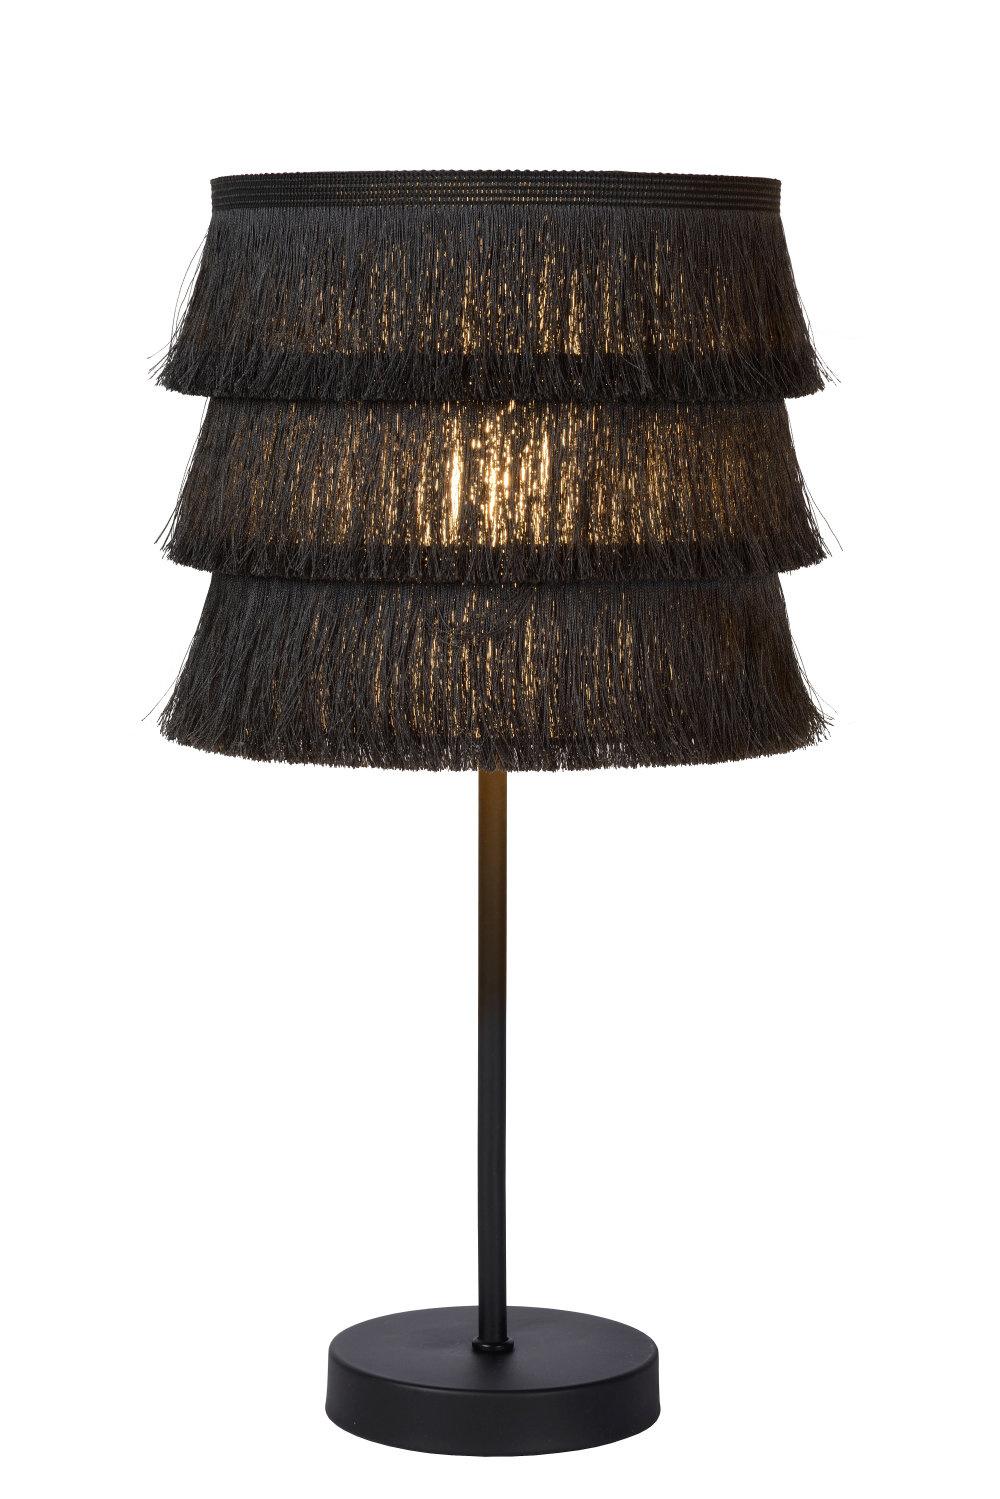 Lucide TOGO. Tafellamp-Grijs-Ø18-1xE14-40W-Katoen